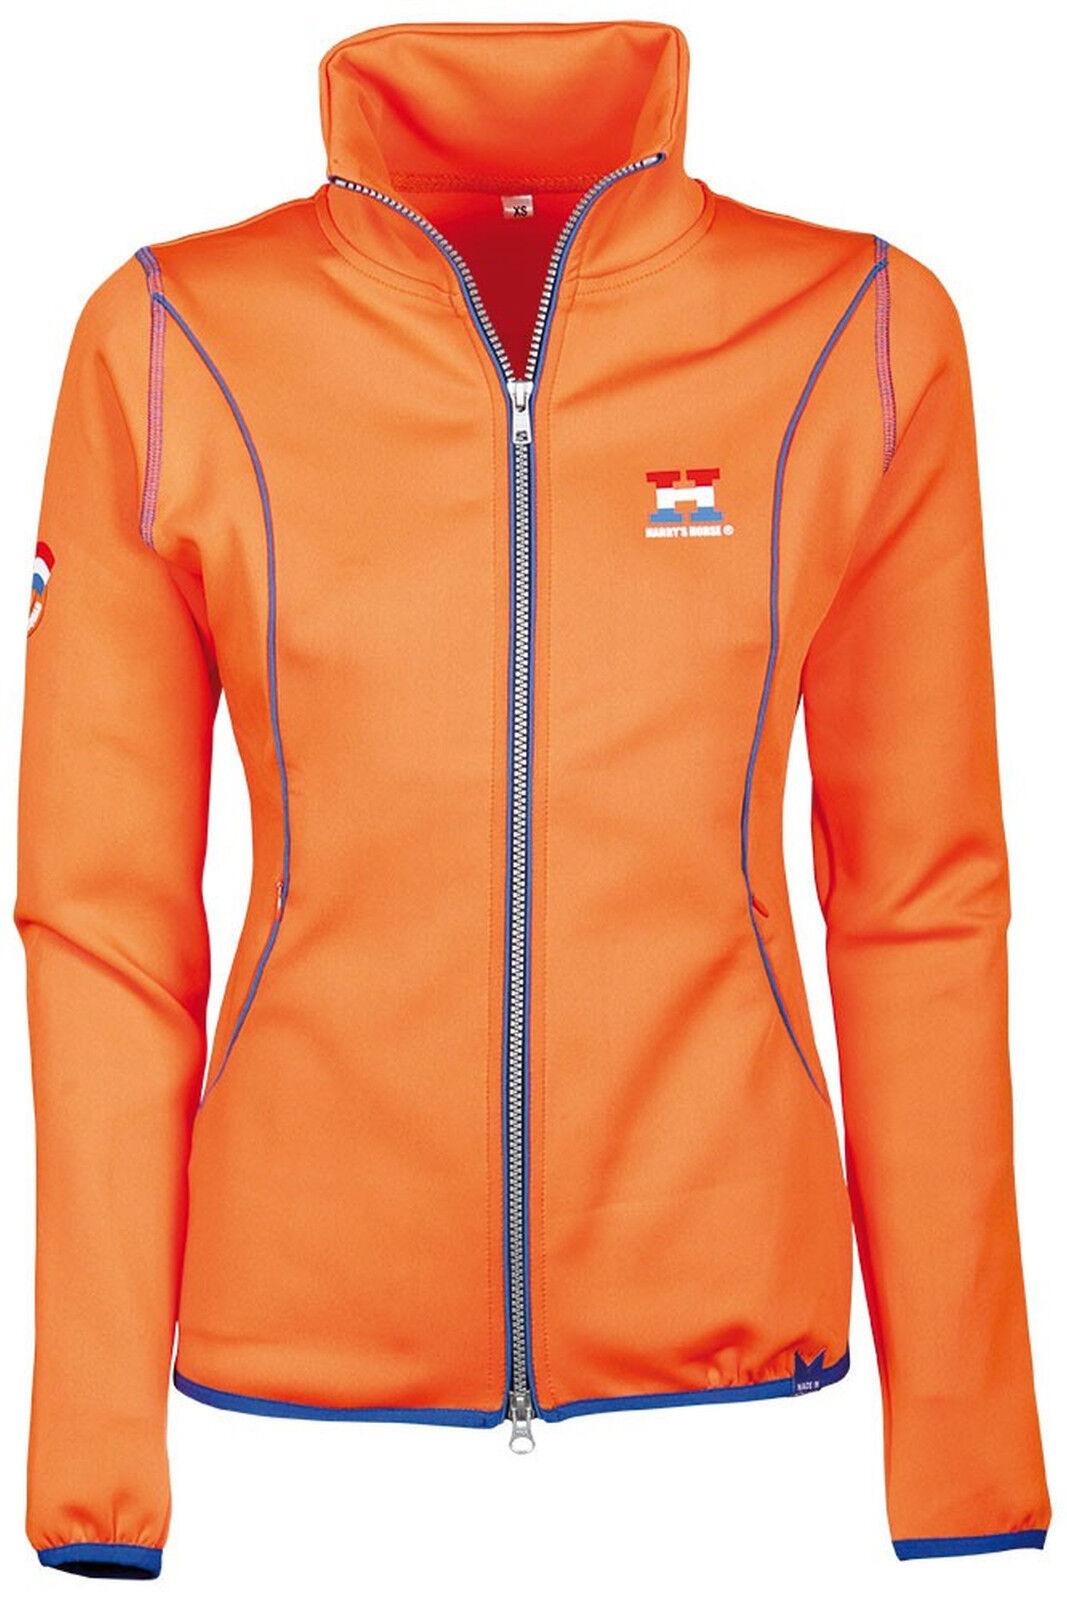 Harry's Horse señora chaqueta Dutch naranja reitjacke cuello alto 2-caminos reißverschl.